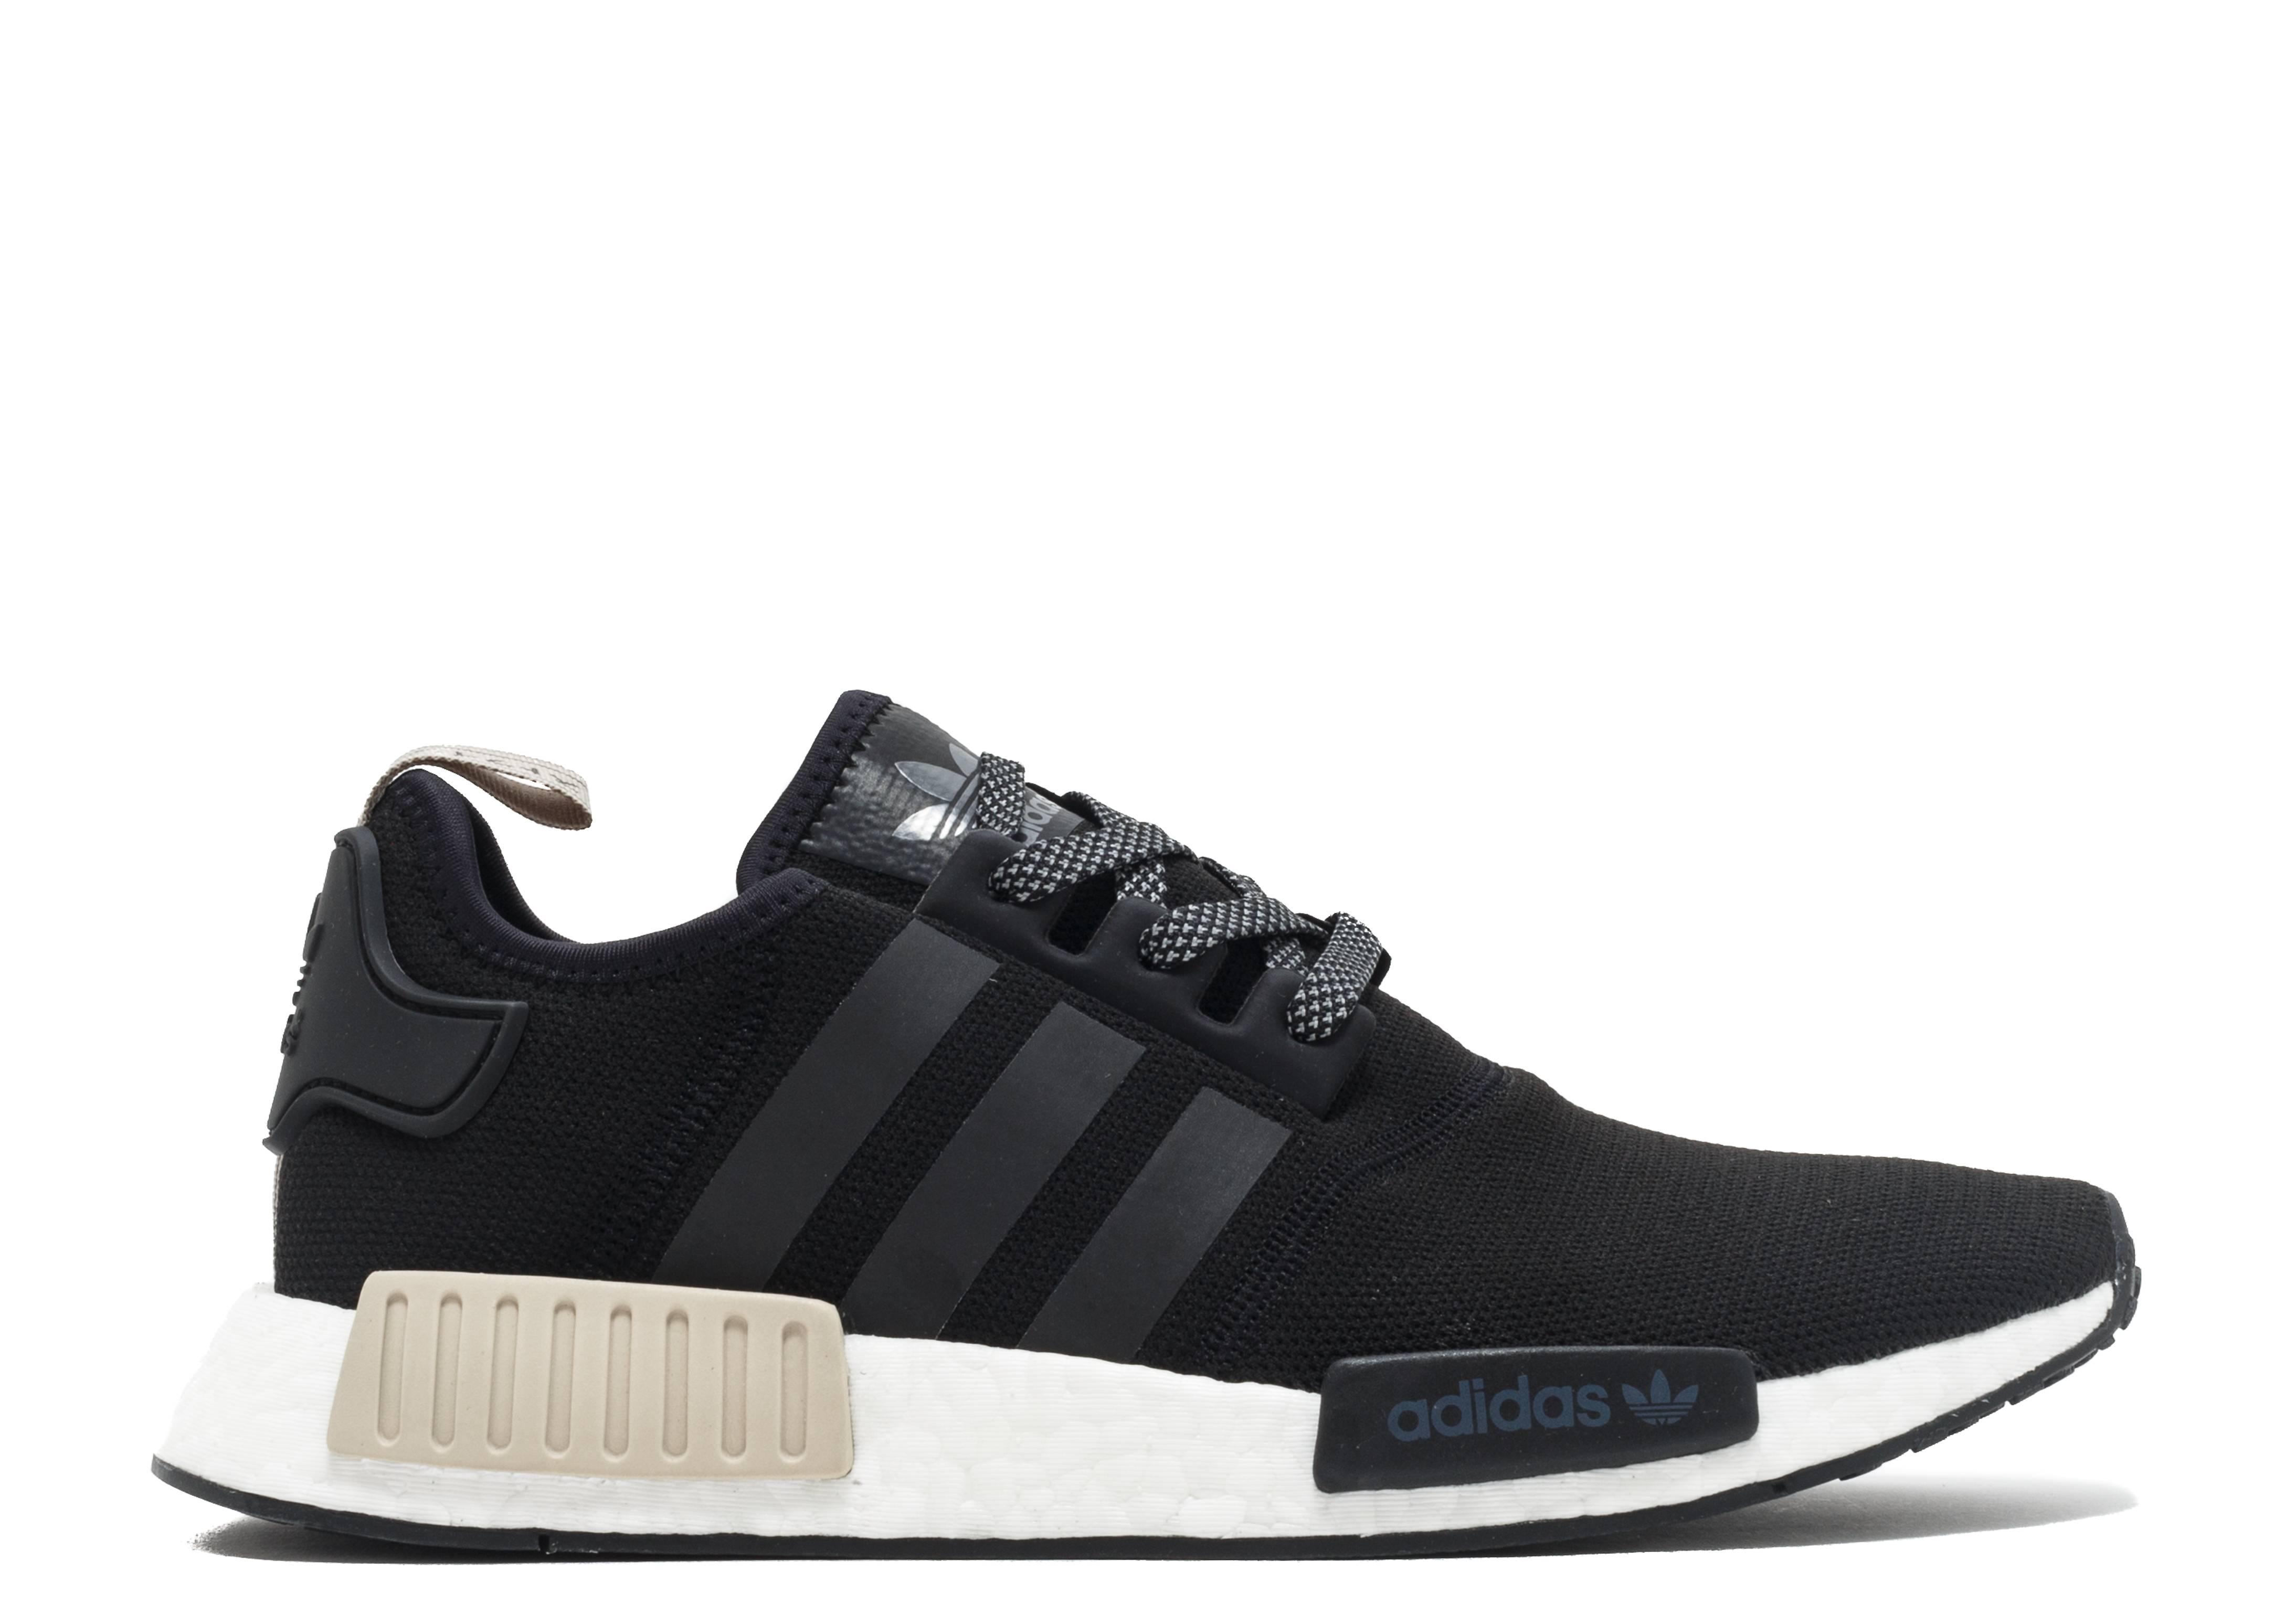 separation shoes 4fda0 ad160 NMD_R1 'Black Sand'